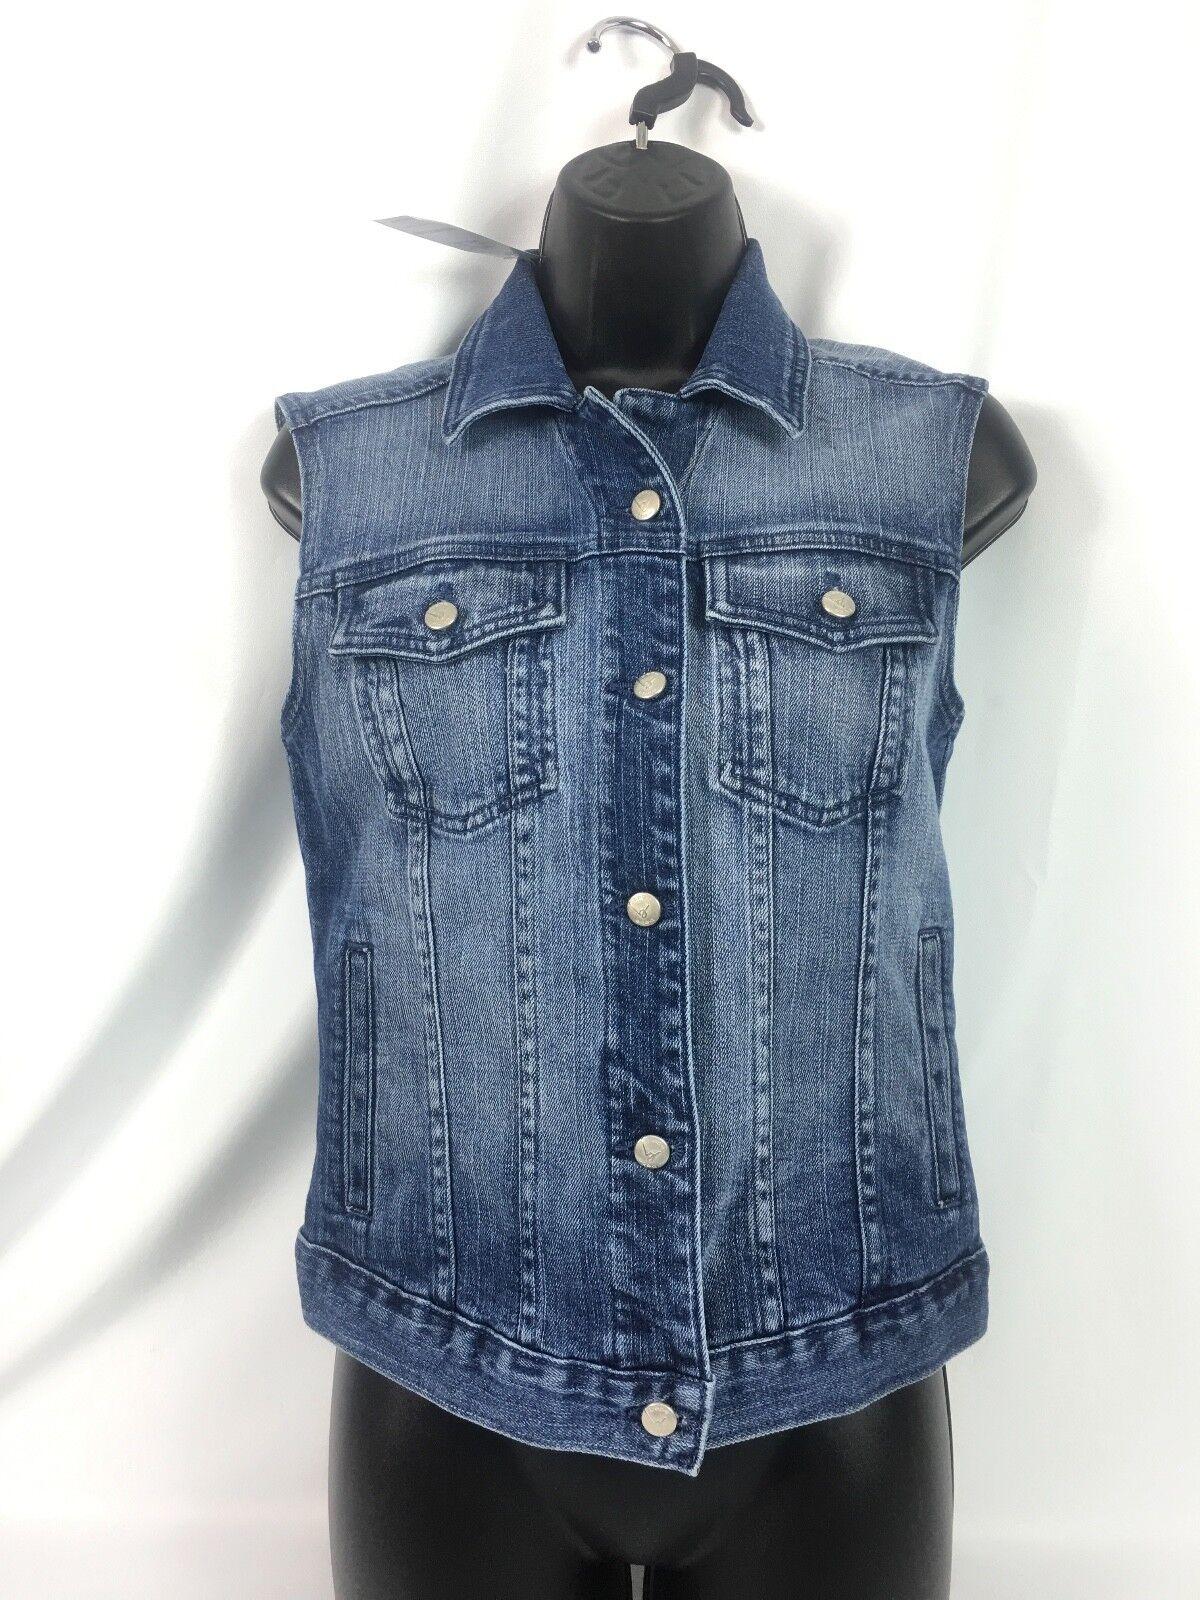 Bebe  Denim Distressed Vest Size XS NWT MSRP 109.00